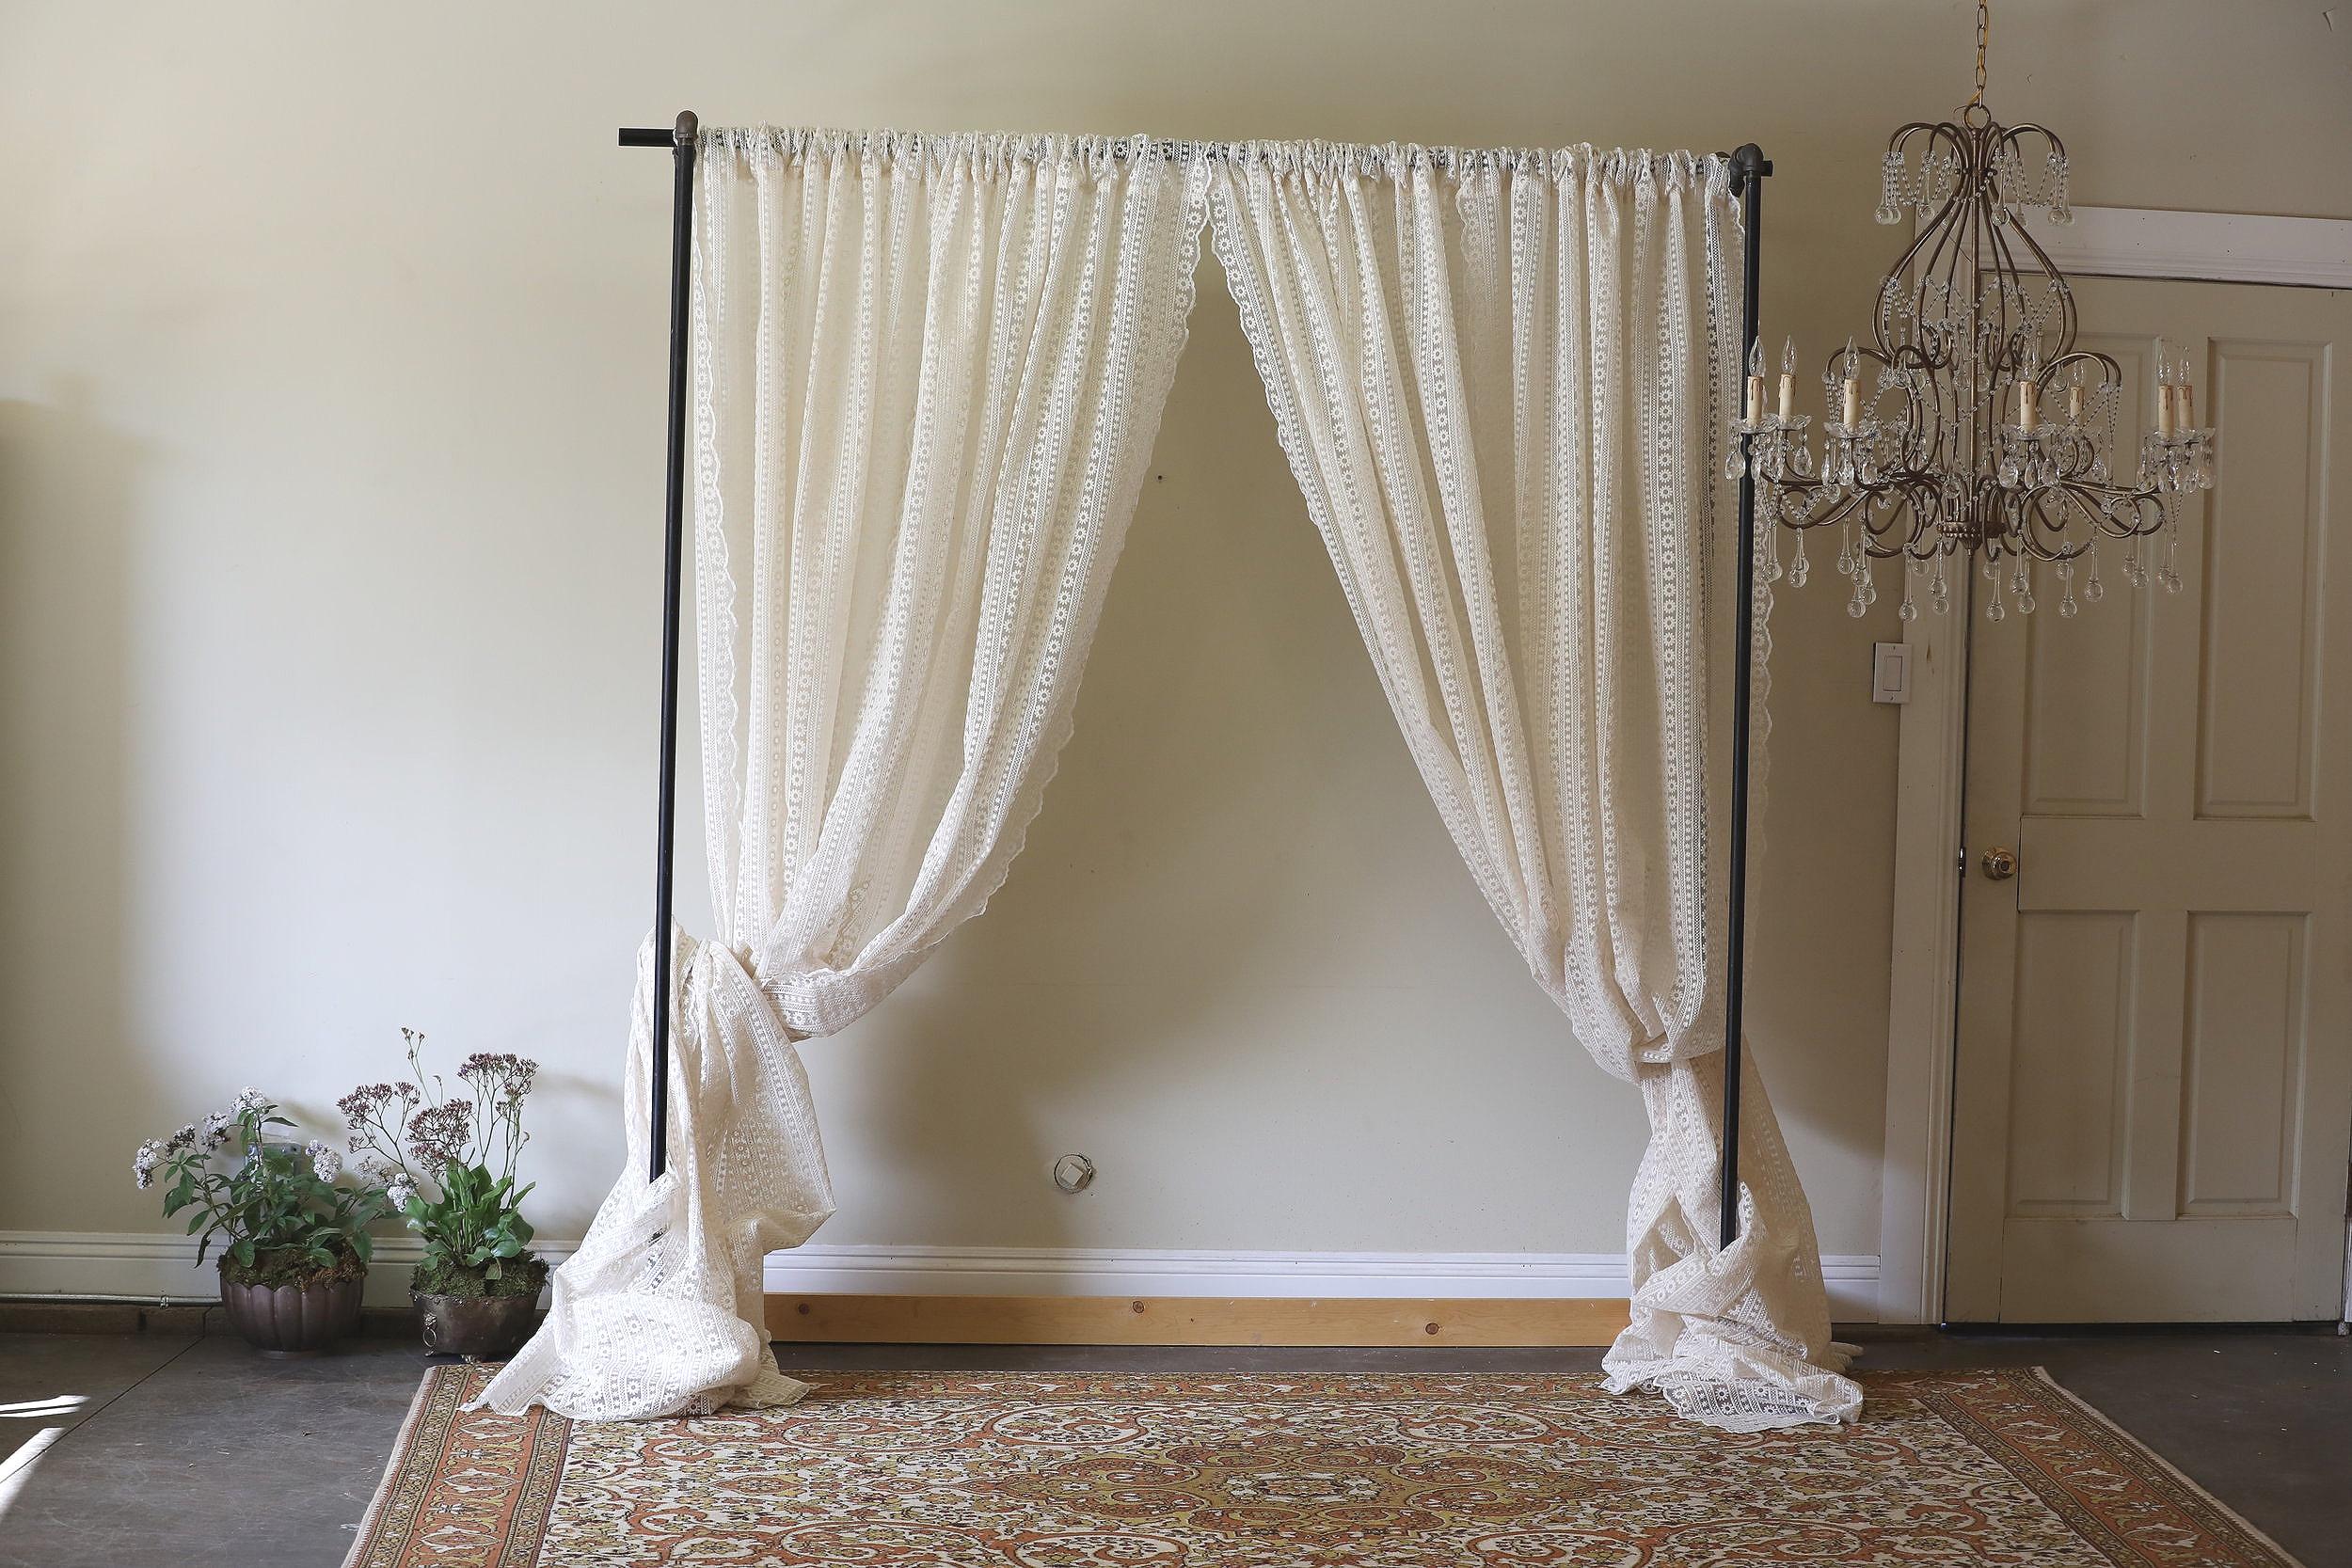 curtain-backdrop+2.jpg